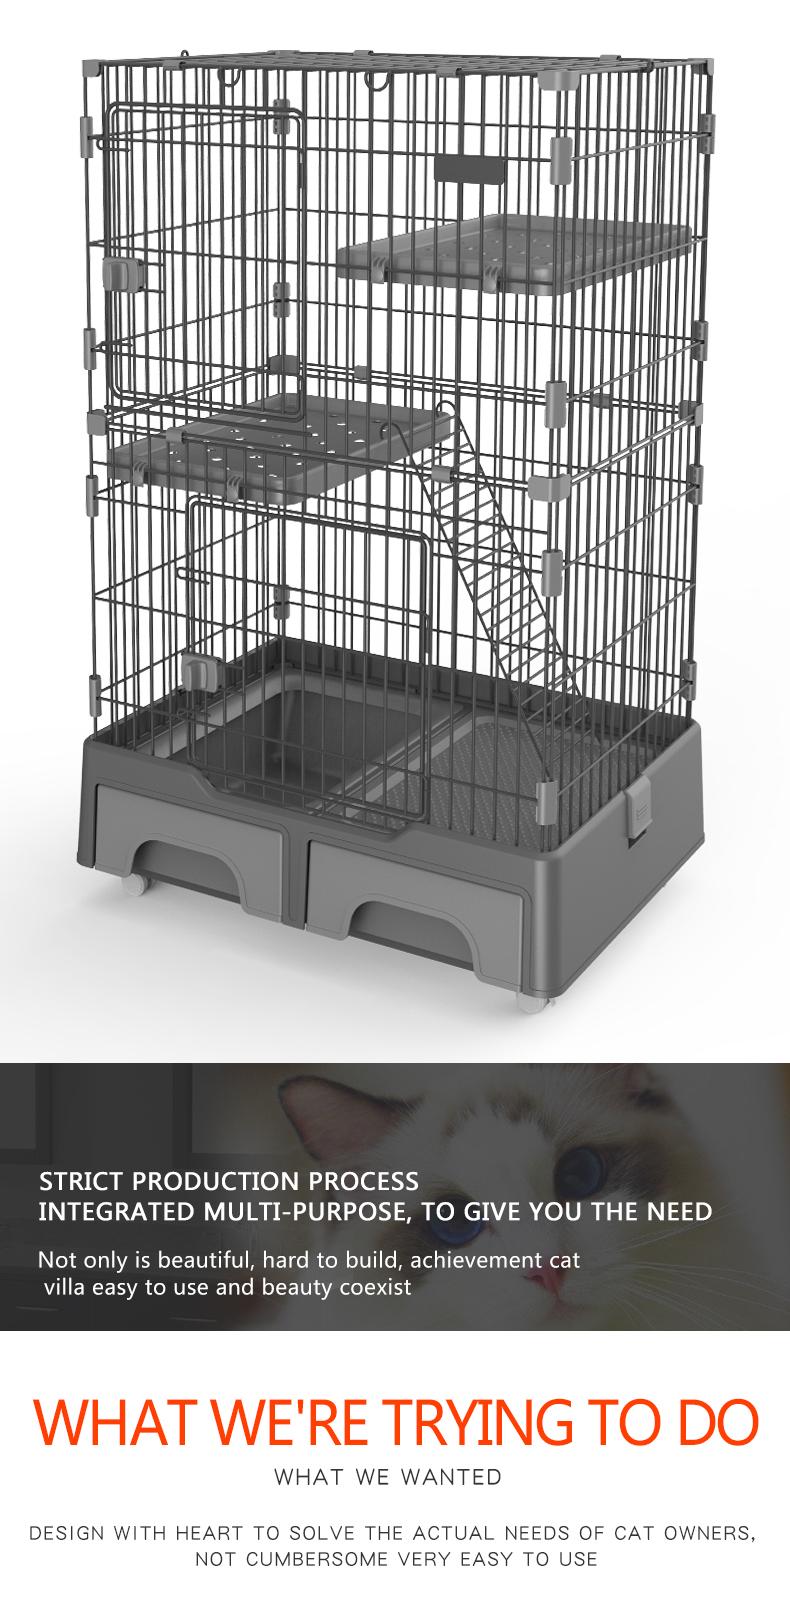 Cat Crate Kennel Manufacturer